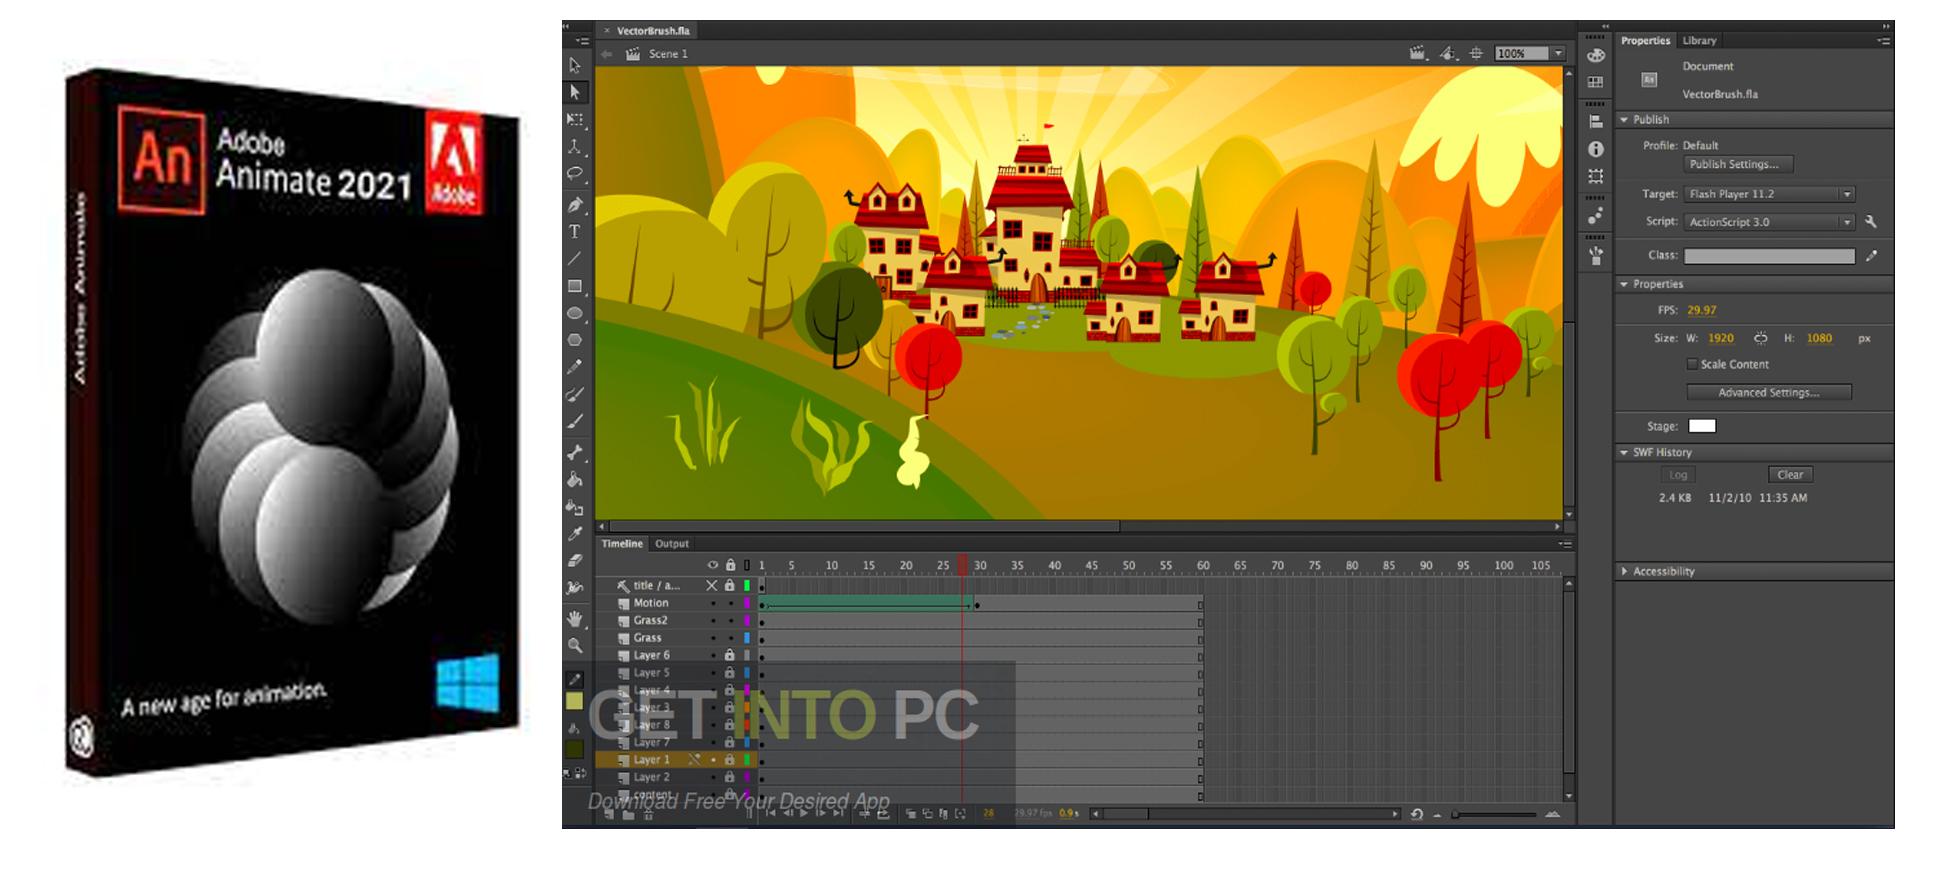 Cara Install Adobe Animate CC 2021 Full Version